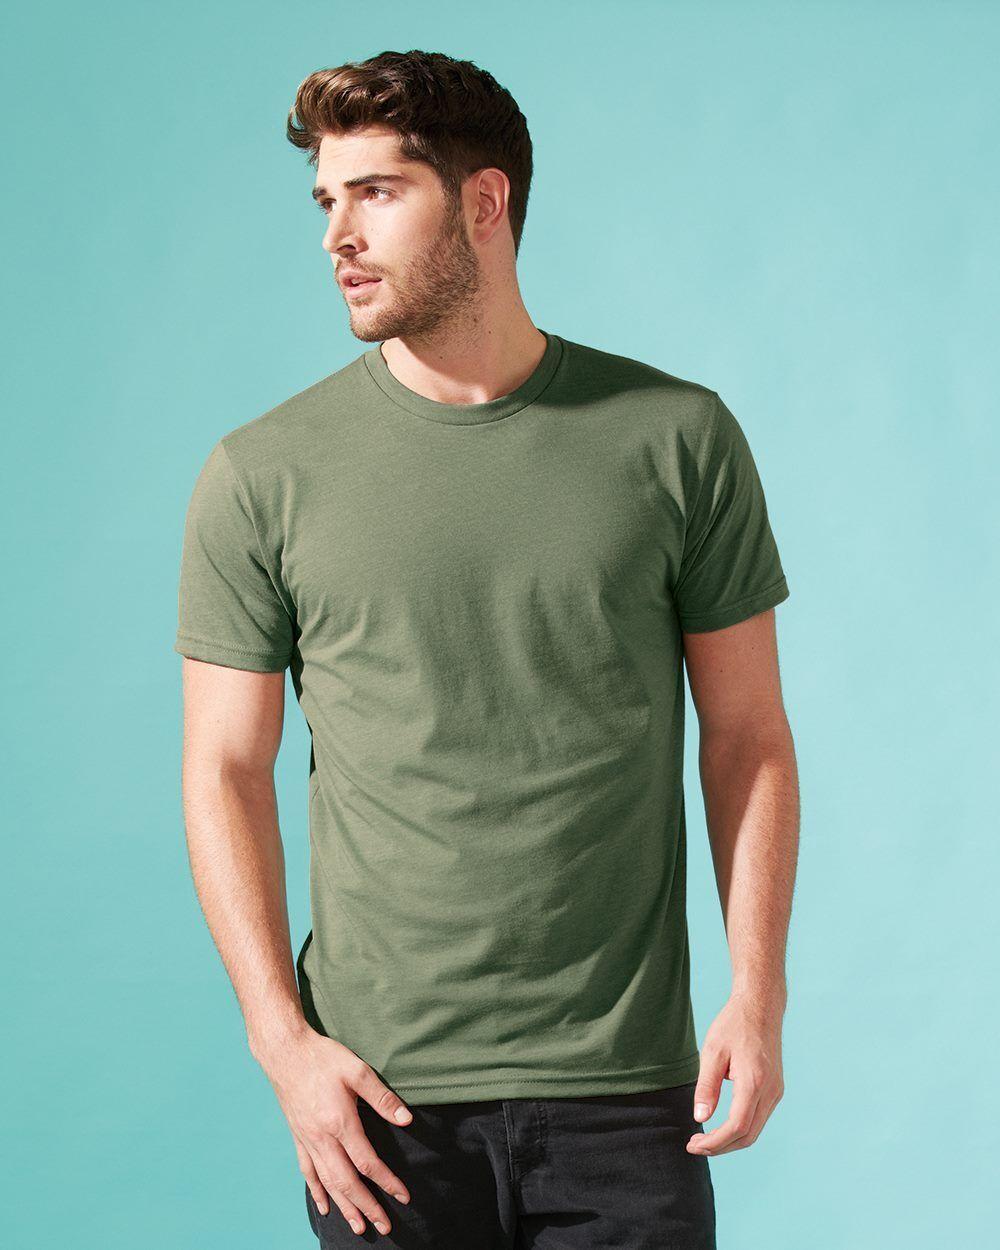 6 Next Level Premium CVC T-Shirt 6210 Wholesale Bulk Lot ok to mix XS-XL colors